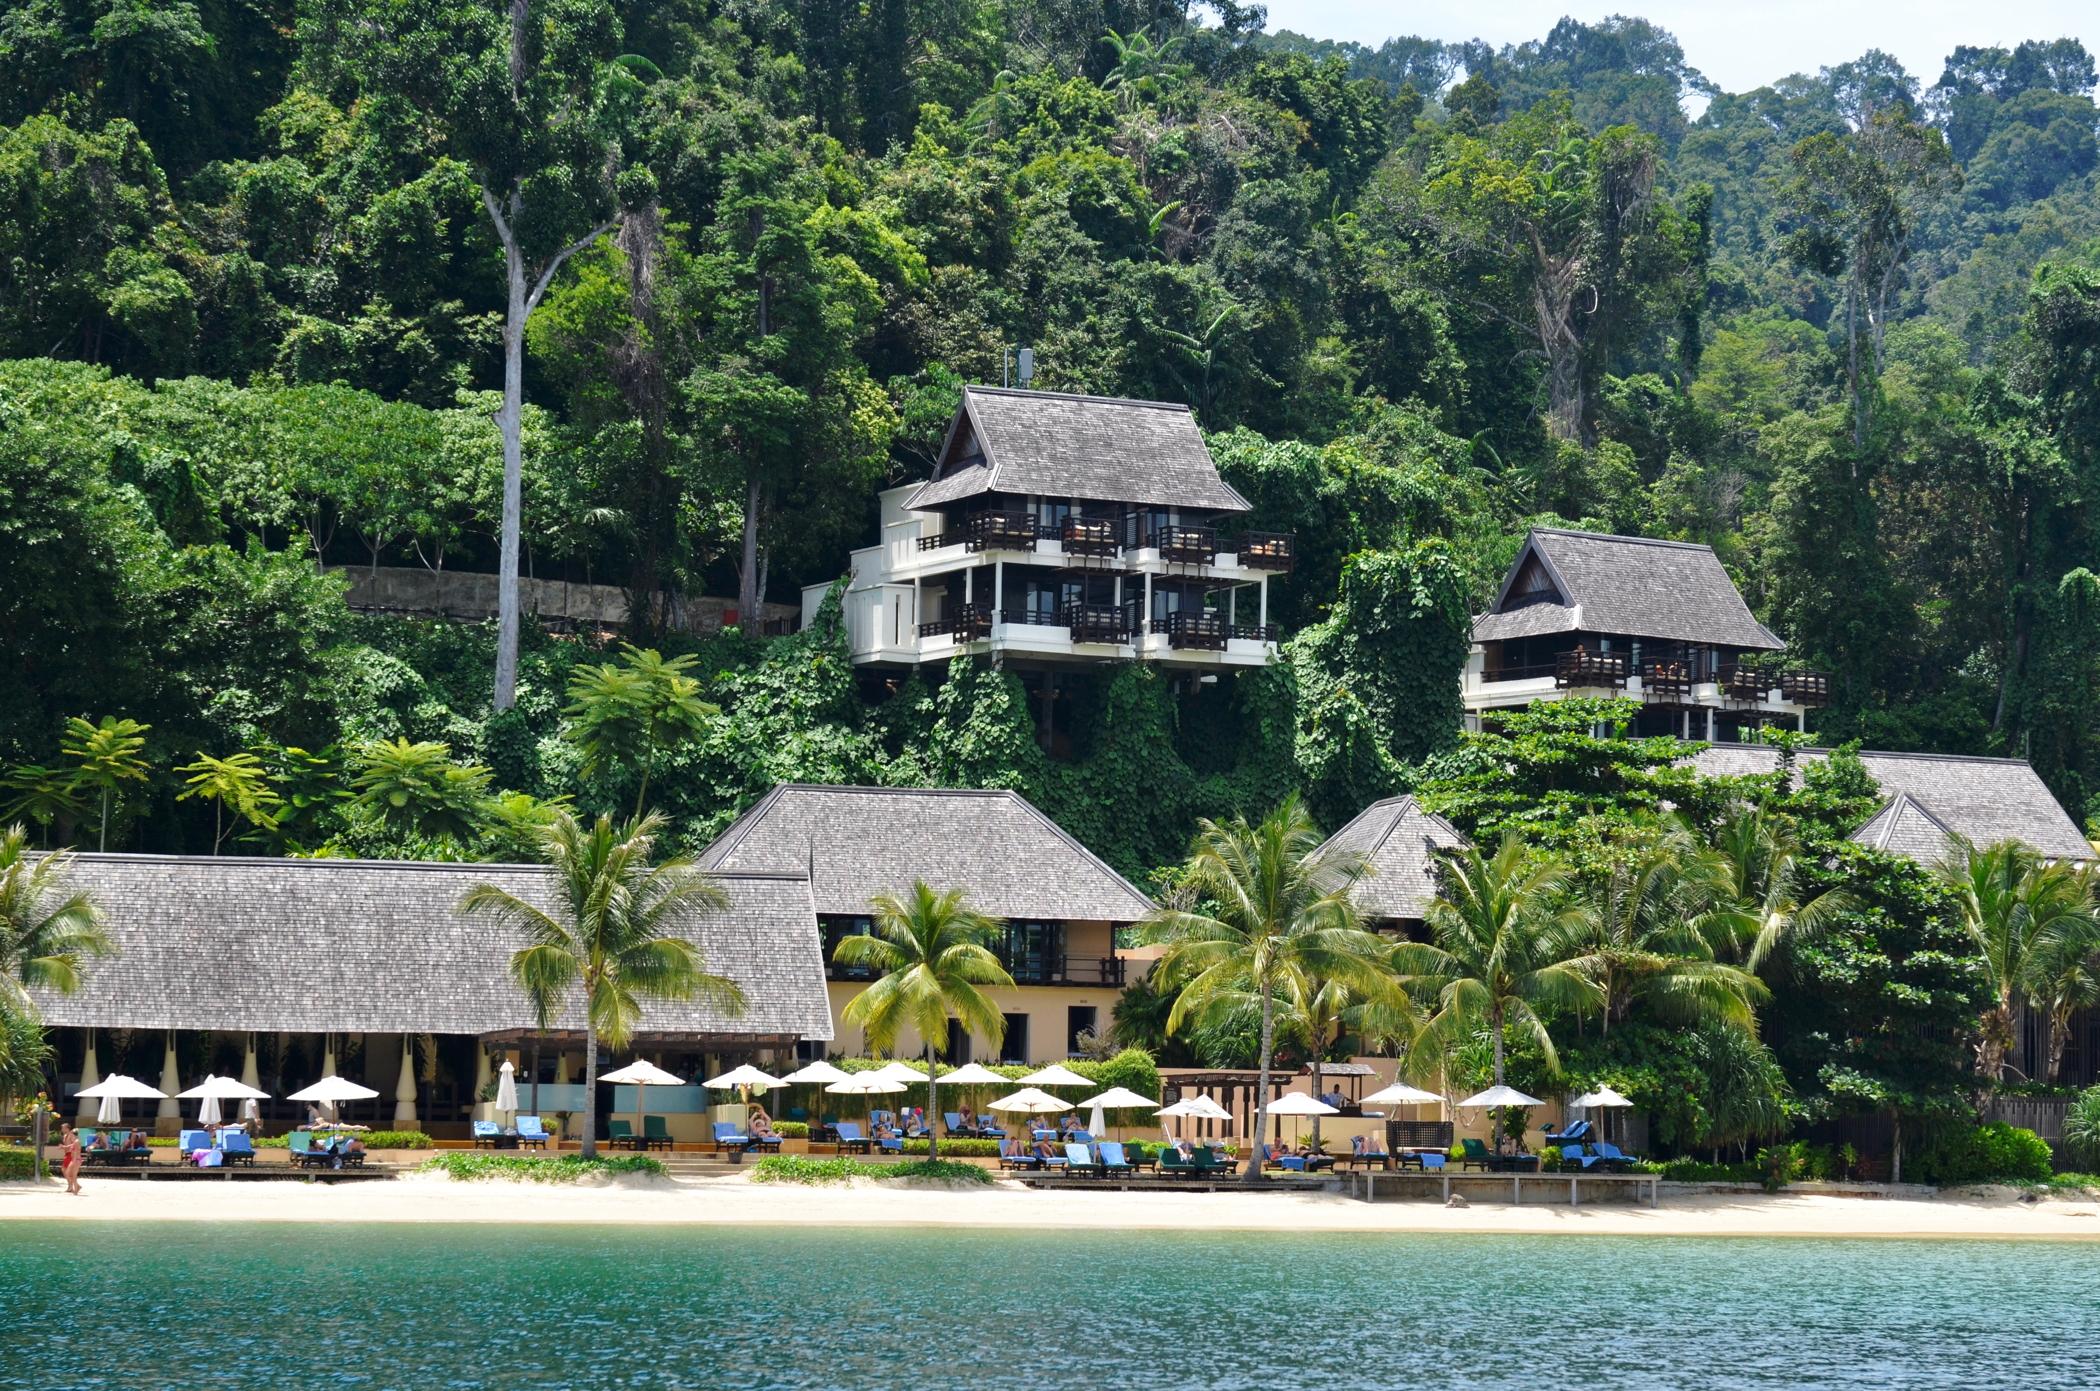 Großstadtdschungel-Malaysia-Gaya-Island-Resort-Villen